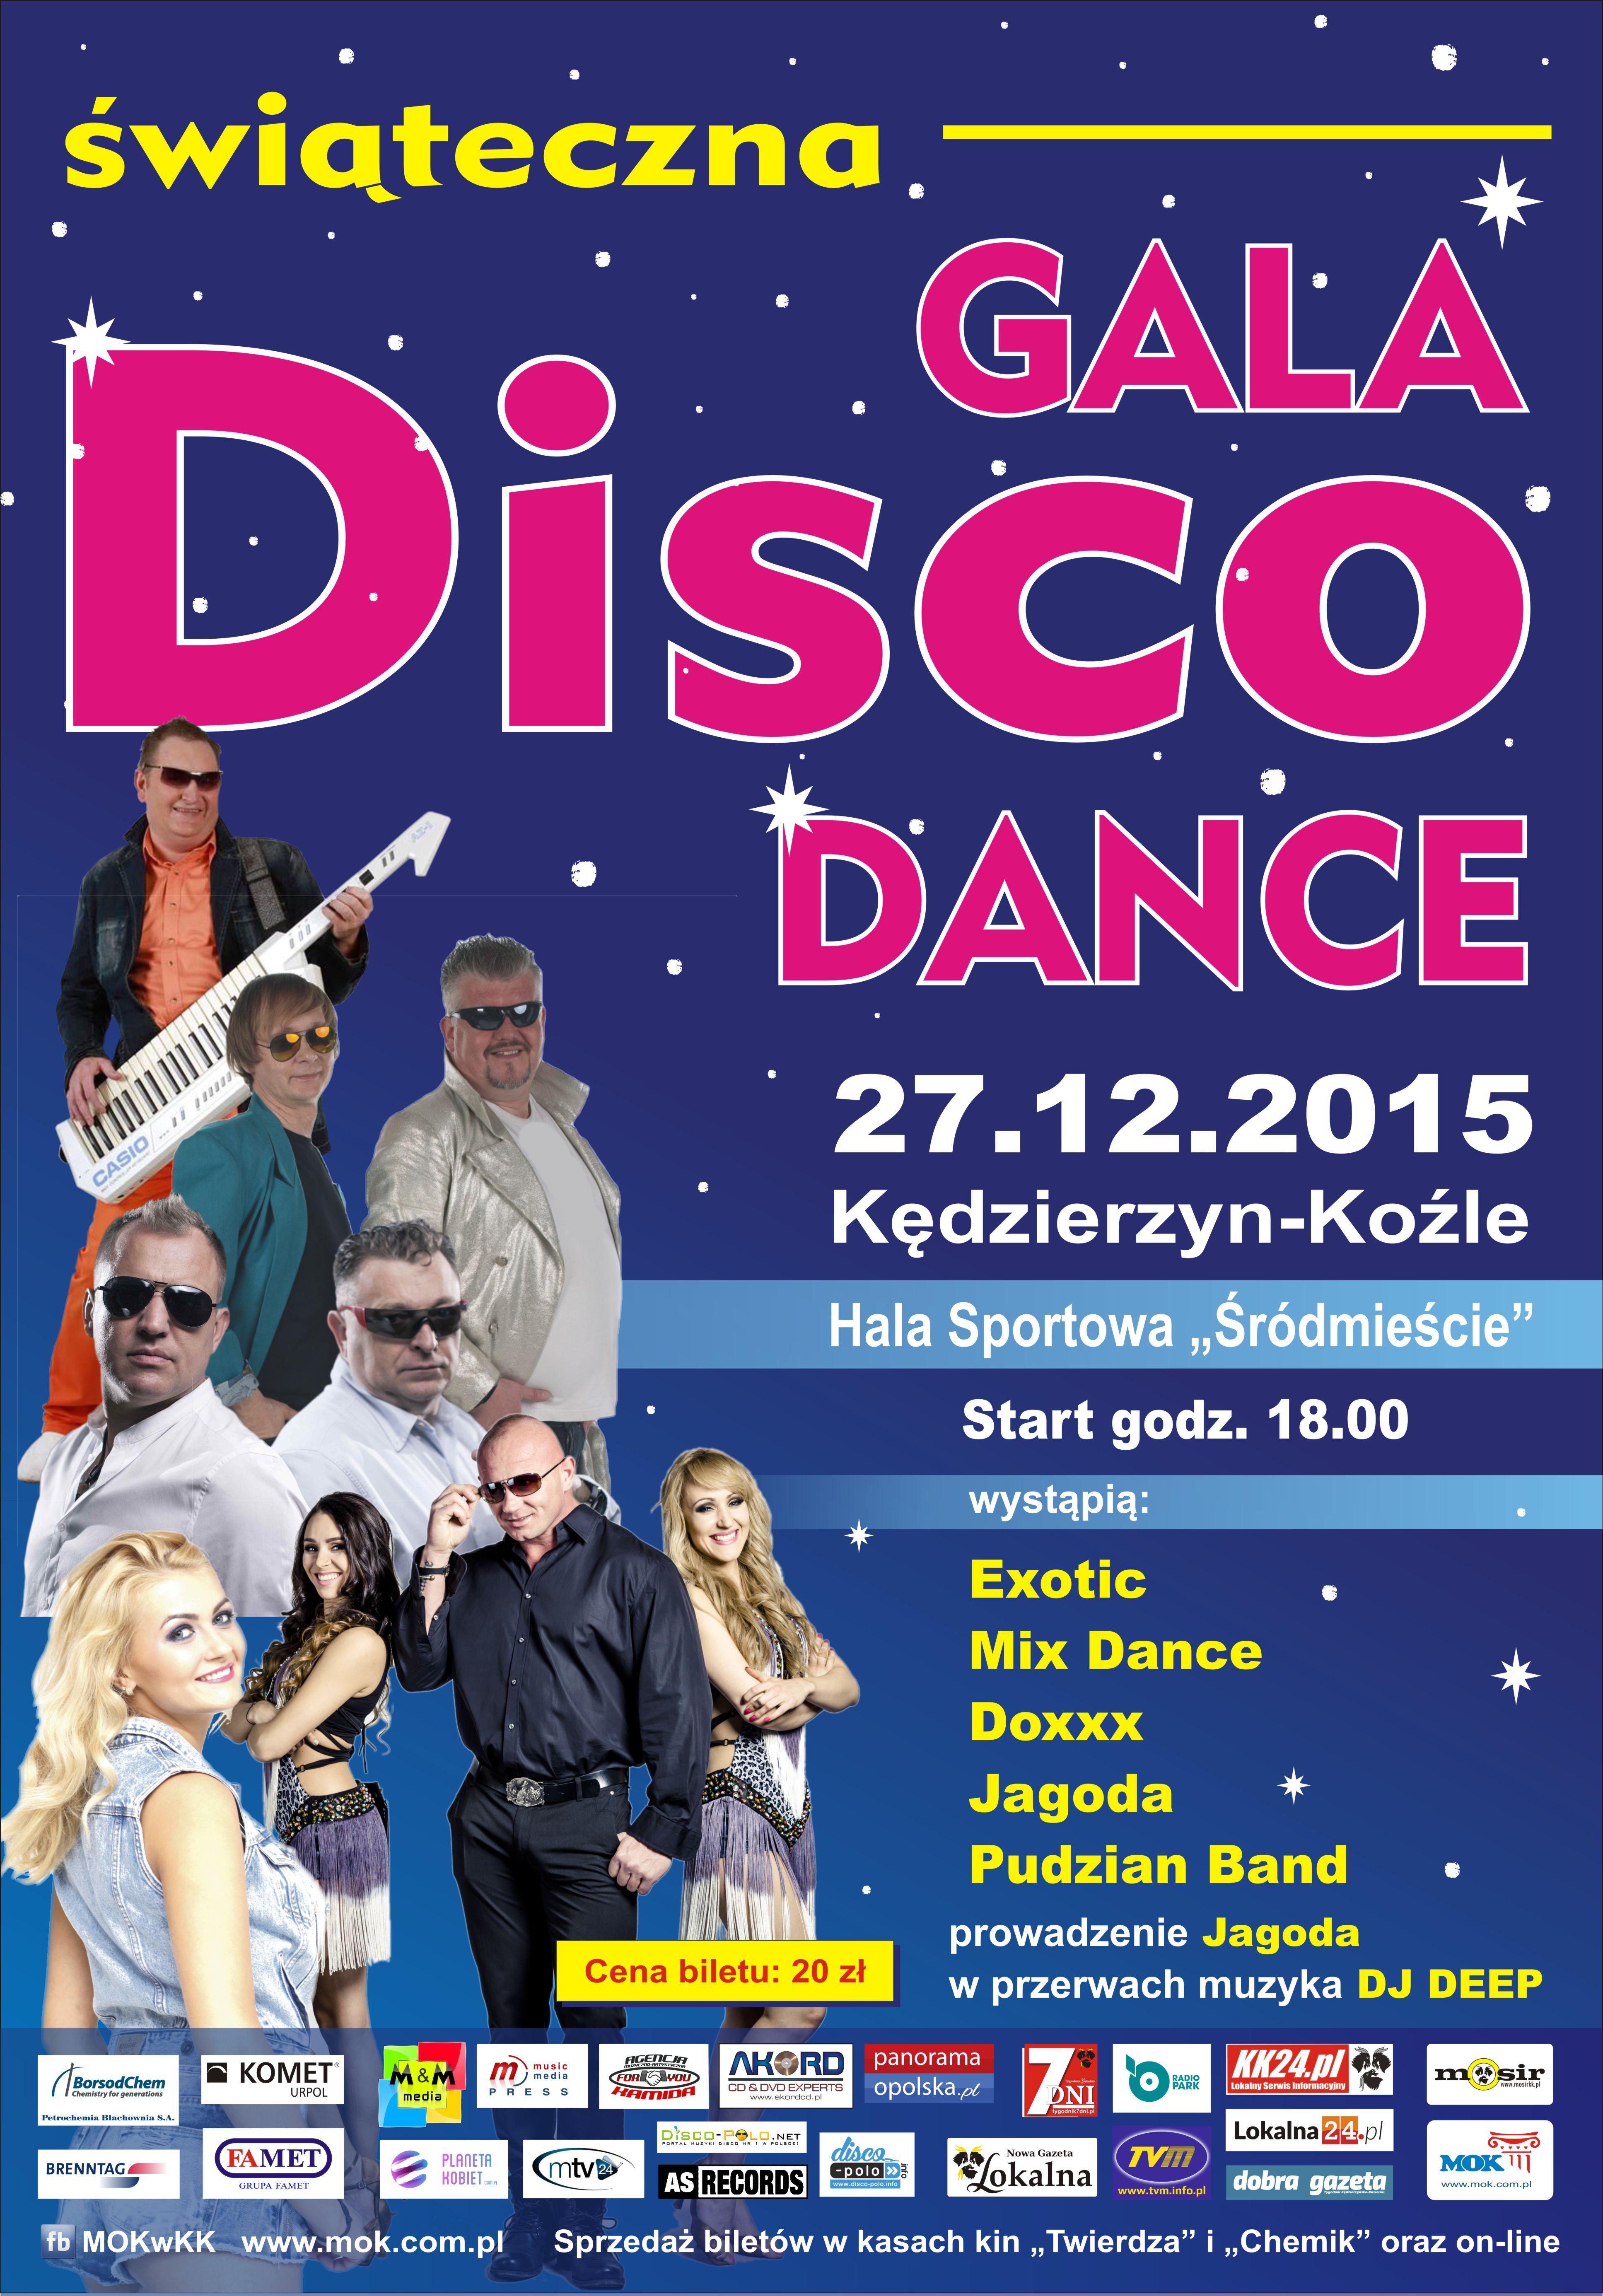 Gala disco dance  - plakat